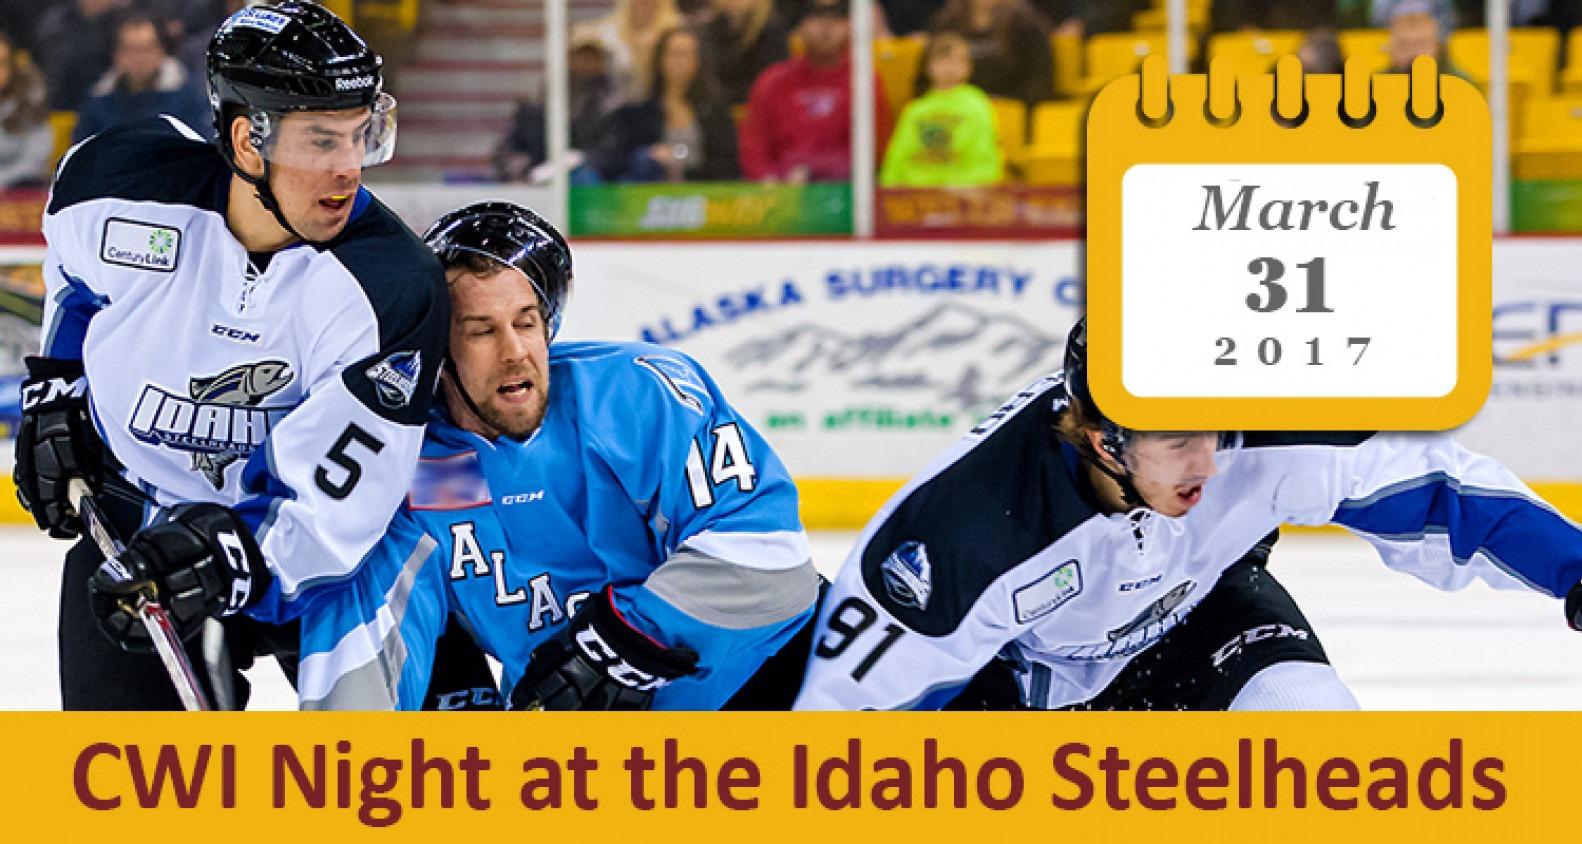 CWI Night at the Idaho Steelheads | March 31, 2017